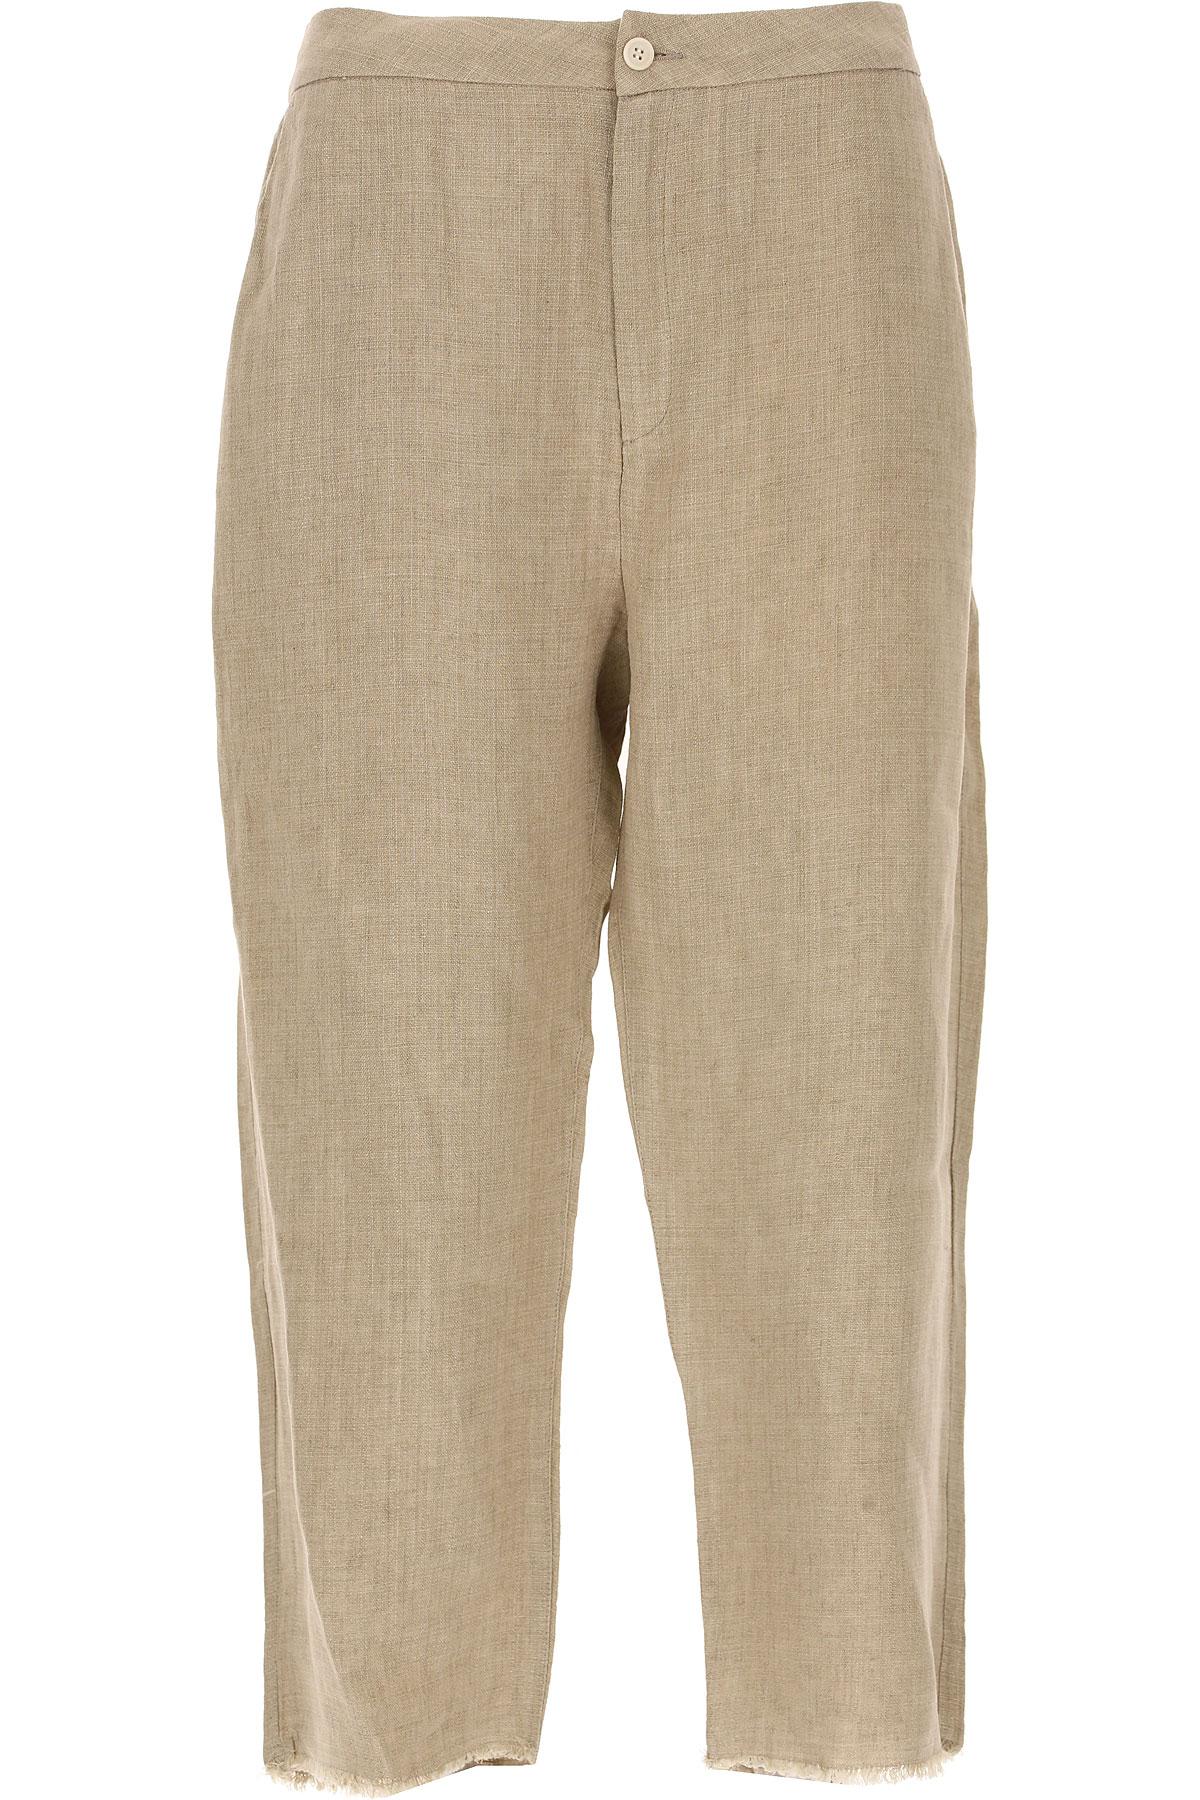 Image of Sibel Saral Pants for Women, Honey, linen, 2017, 4 6